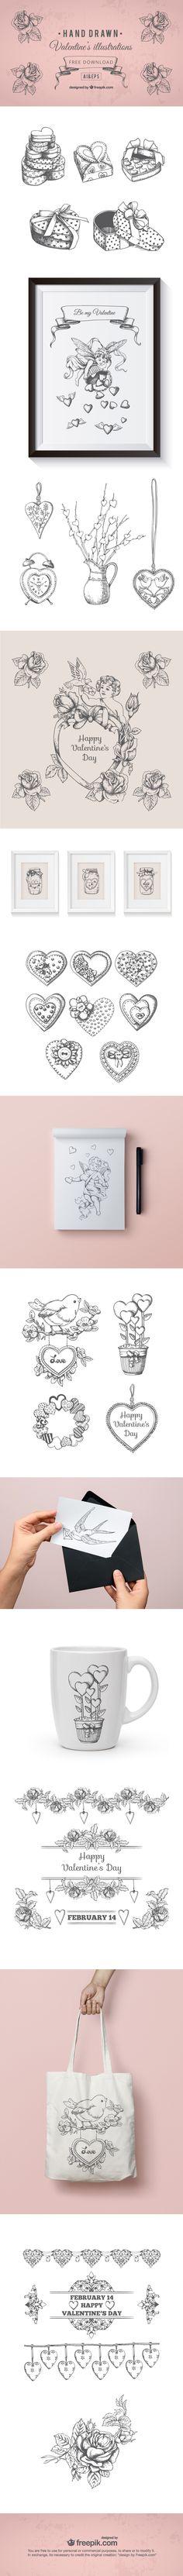 Free Hand Drawn Valentines Day Illustrations